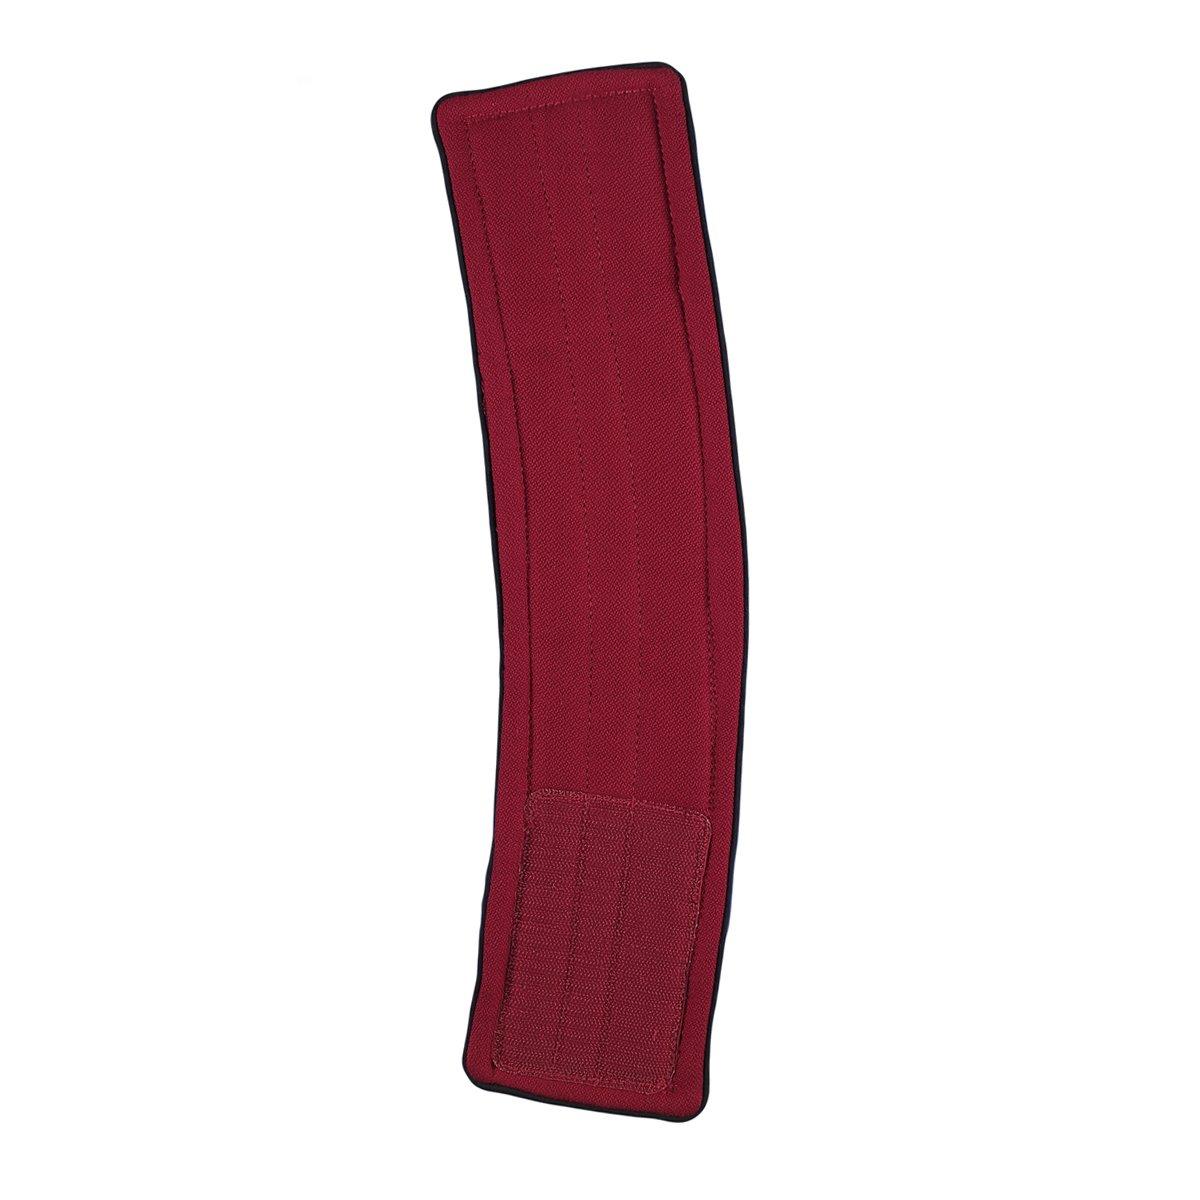 Hoppediz–bonv-Mel cintura garanzia Bla per Bondolino portabebè–Marsupio portabebè, colore: blu melange bonv-bla-mel